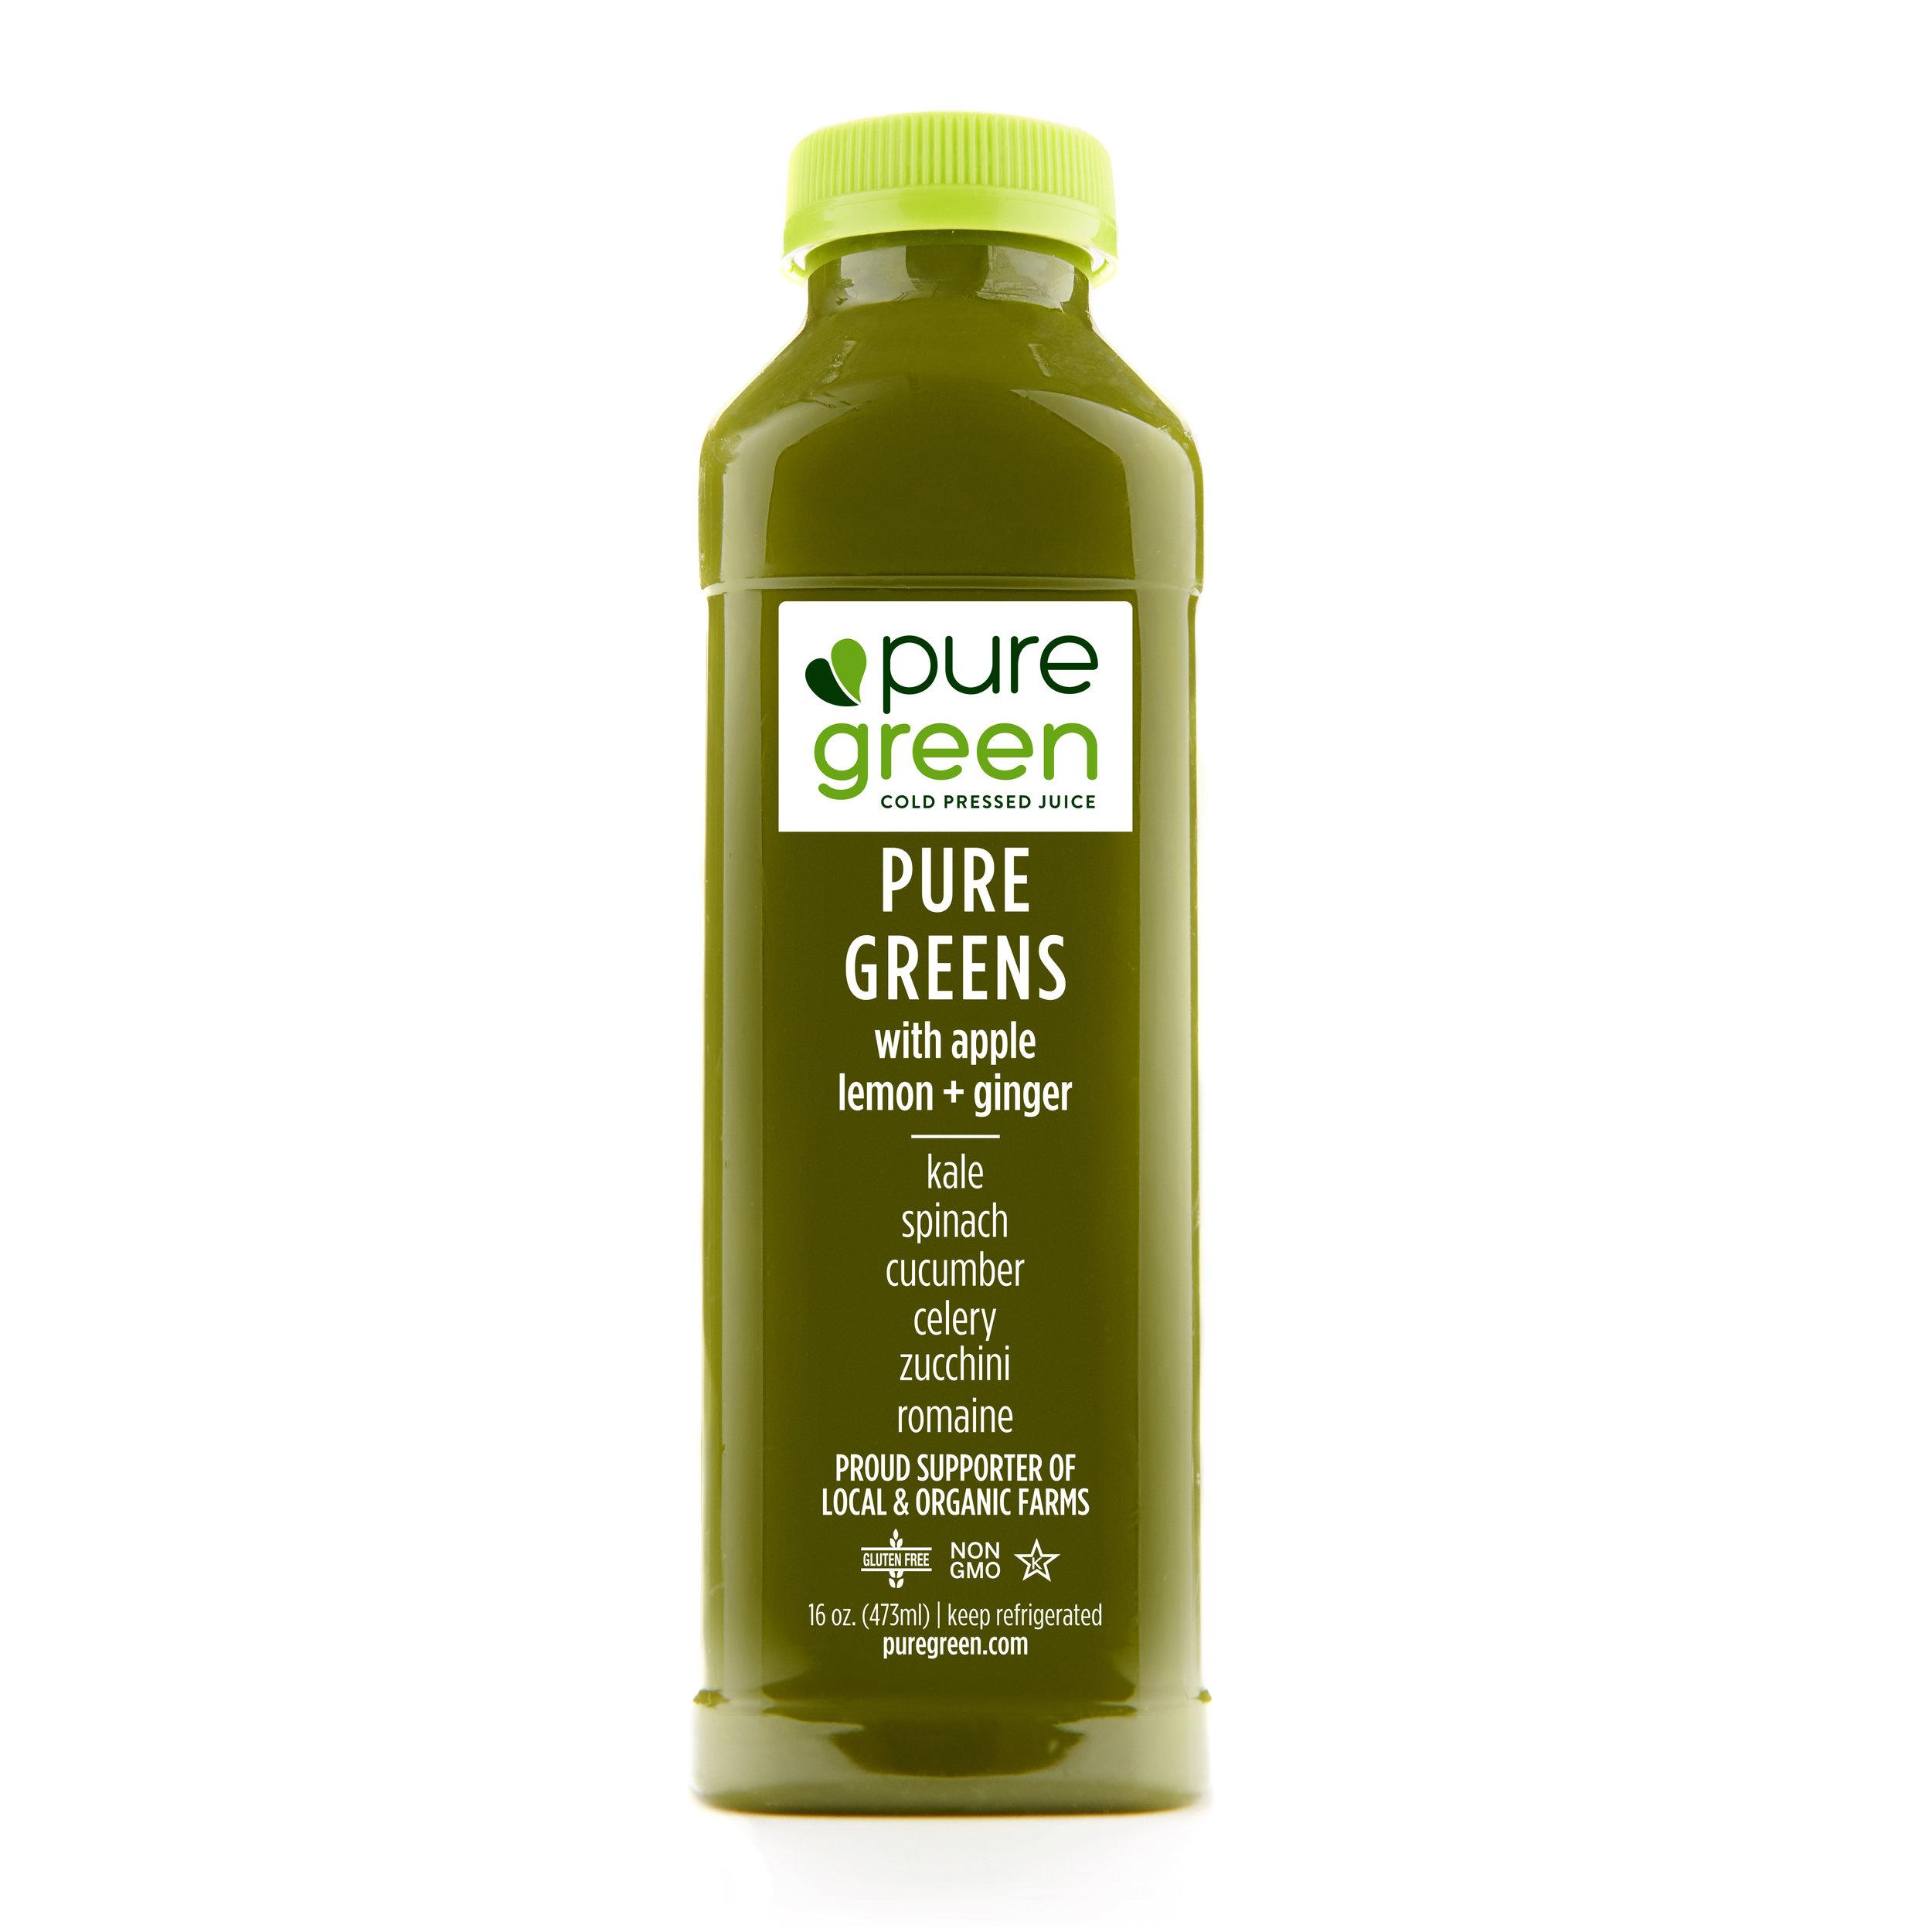 Pure Greens ALG 16oz Juice.jpg